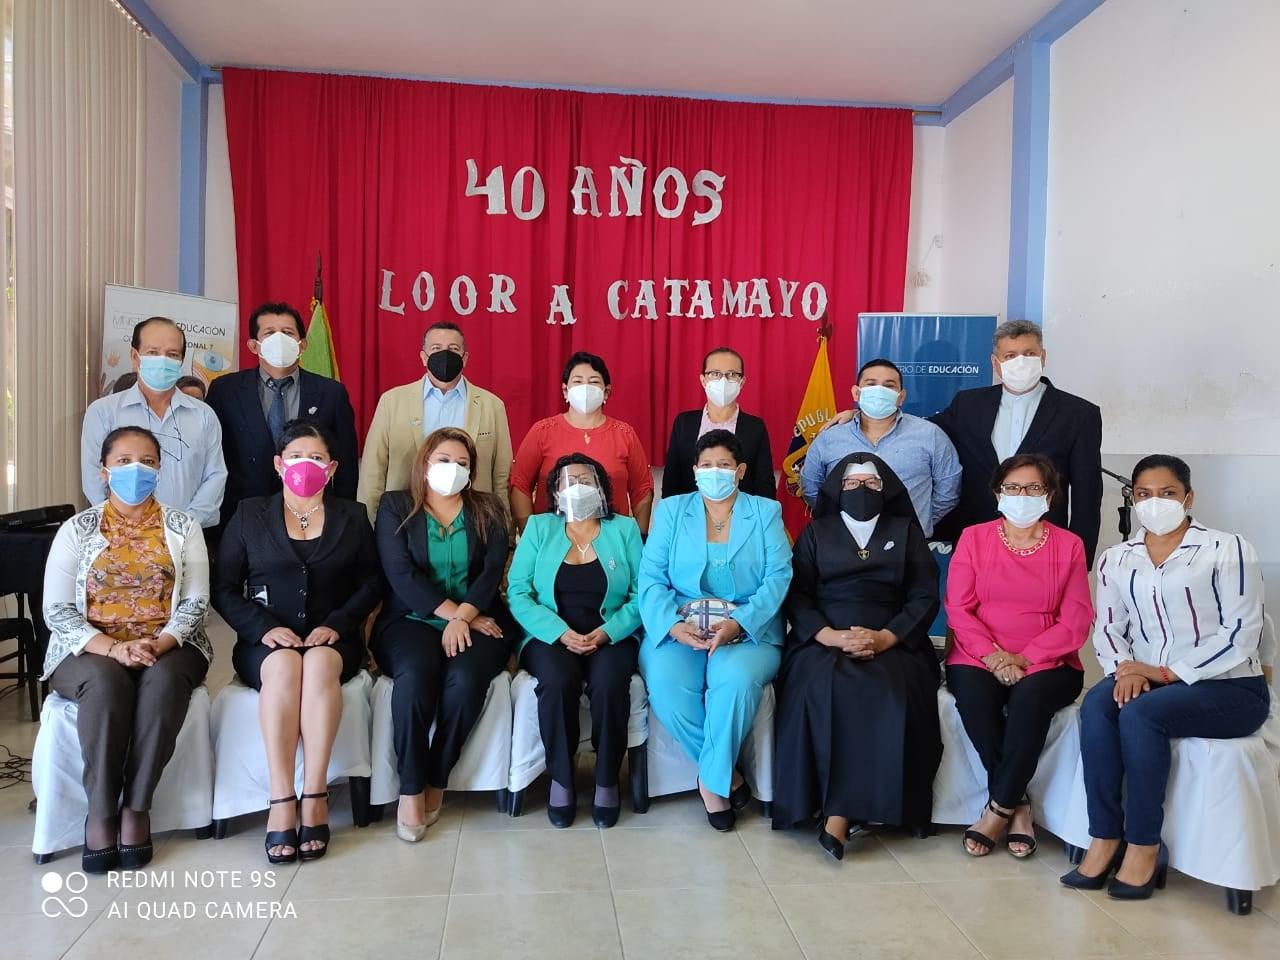 Distrito educativo rinde tributo a Catamayo por cantonización